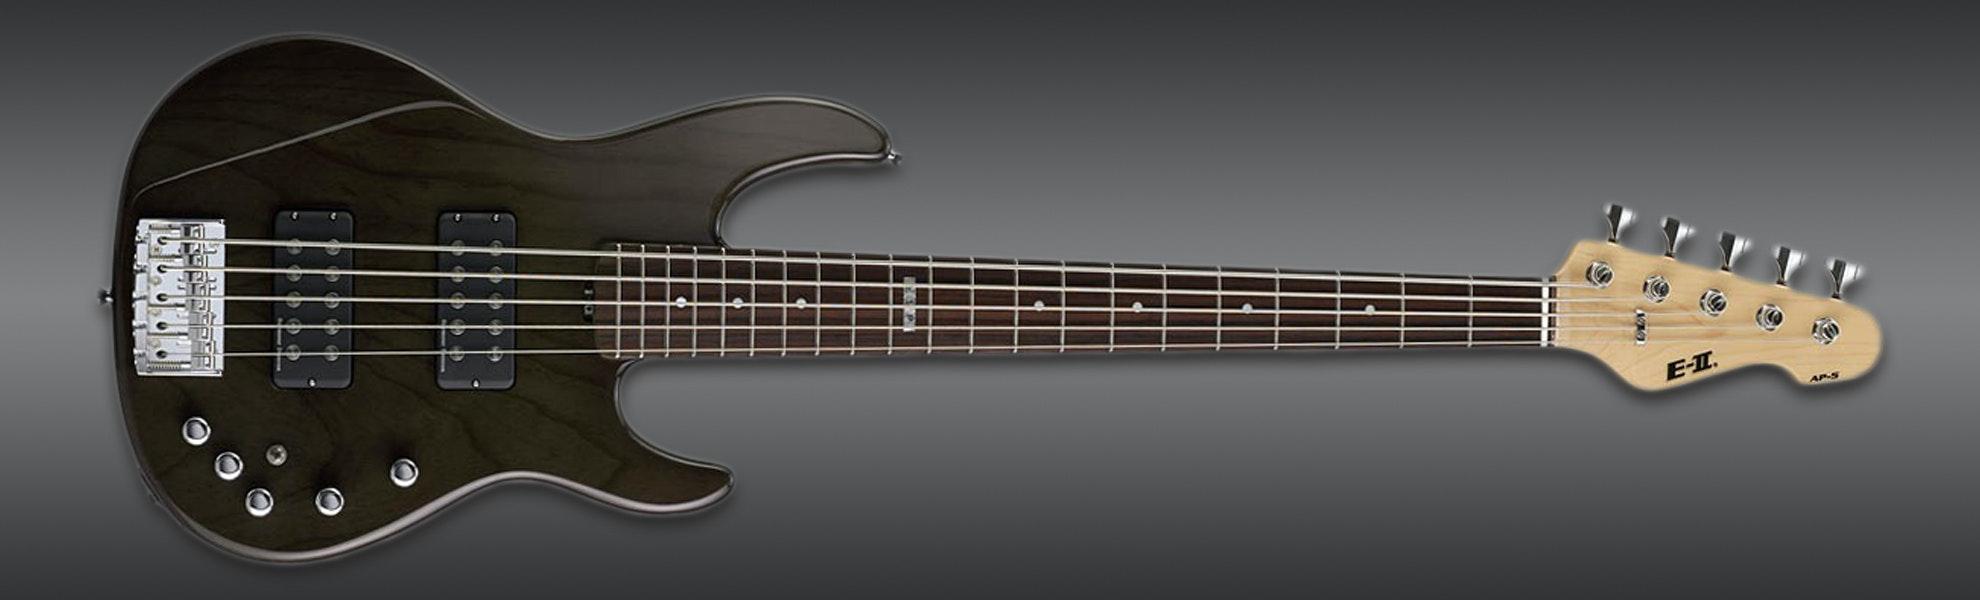 ESP Bass Guitar E-II AP 5 String